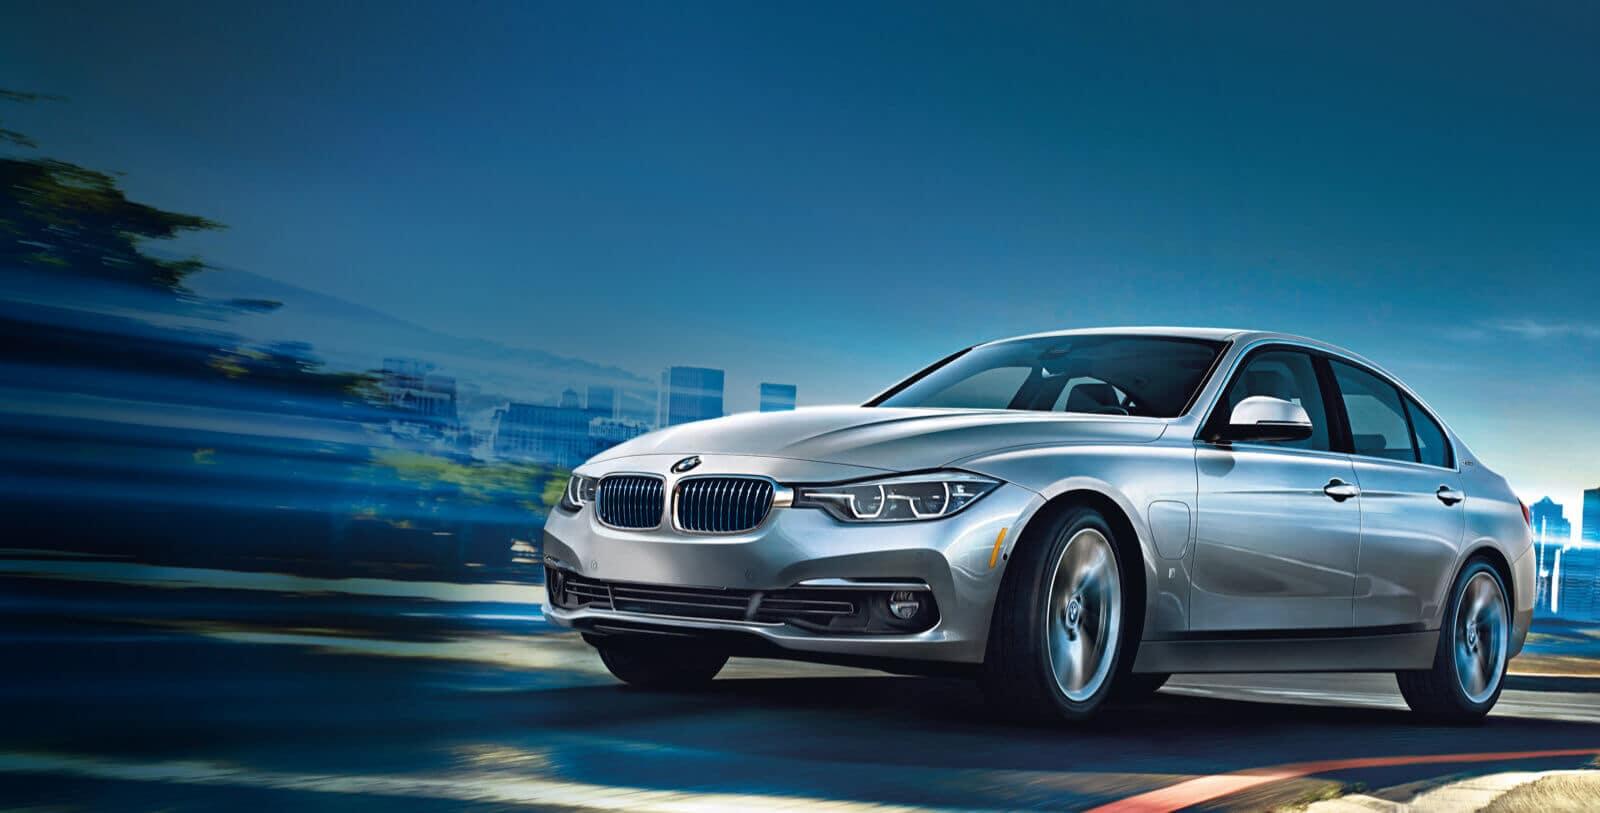 BMW_3Series_Sedan_Highlight_07.jpg